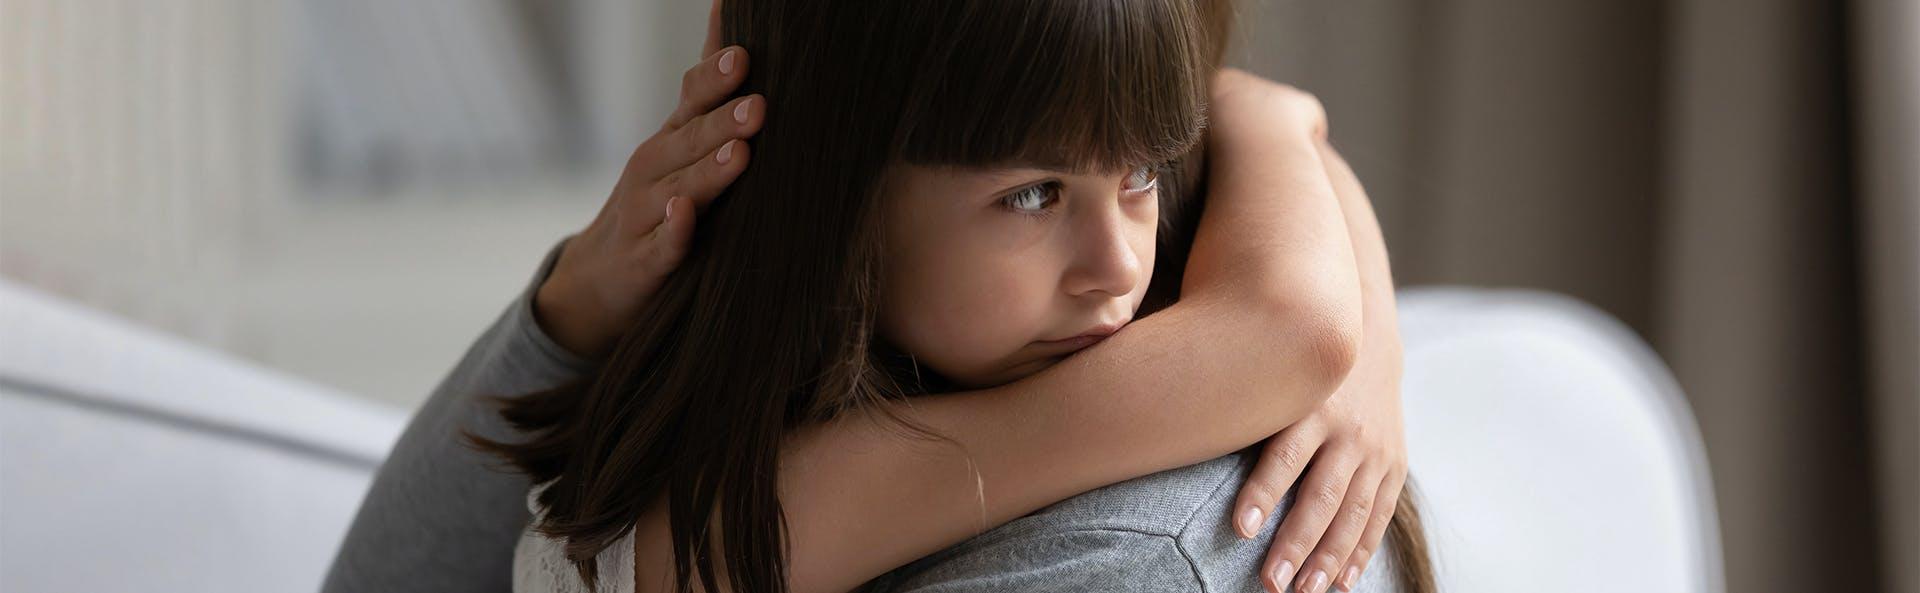 Mother hugging her sick daughter.